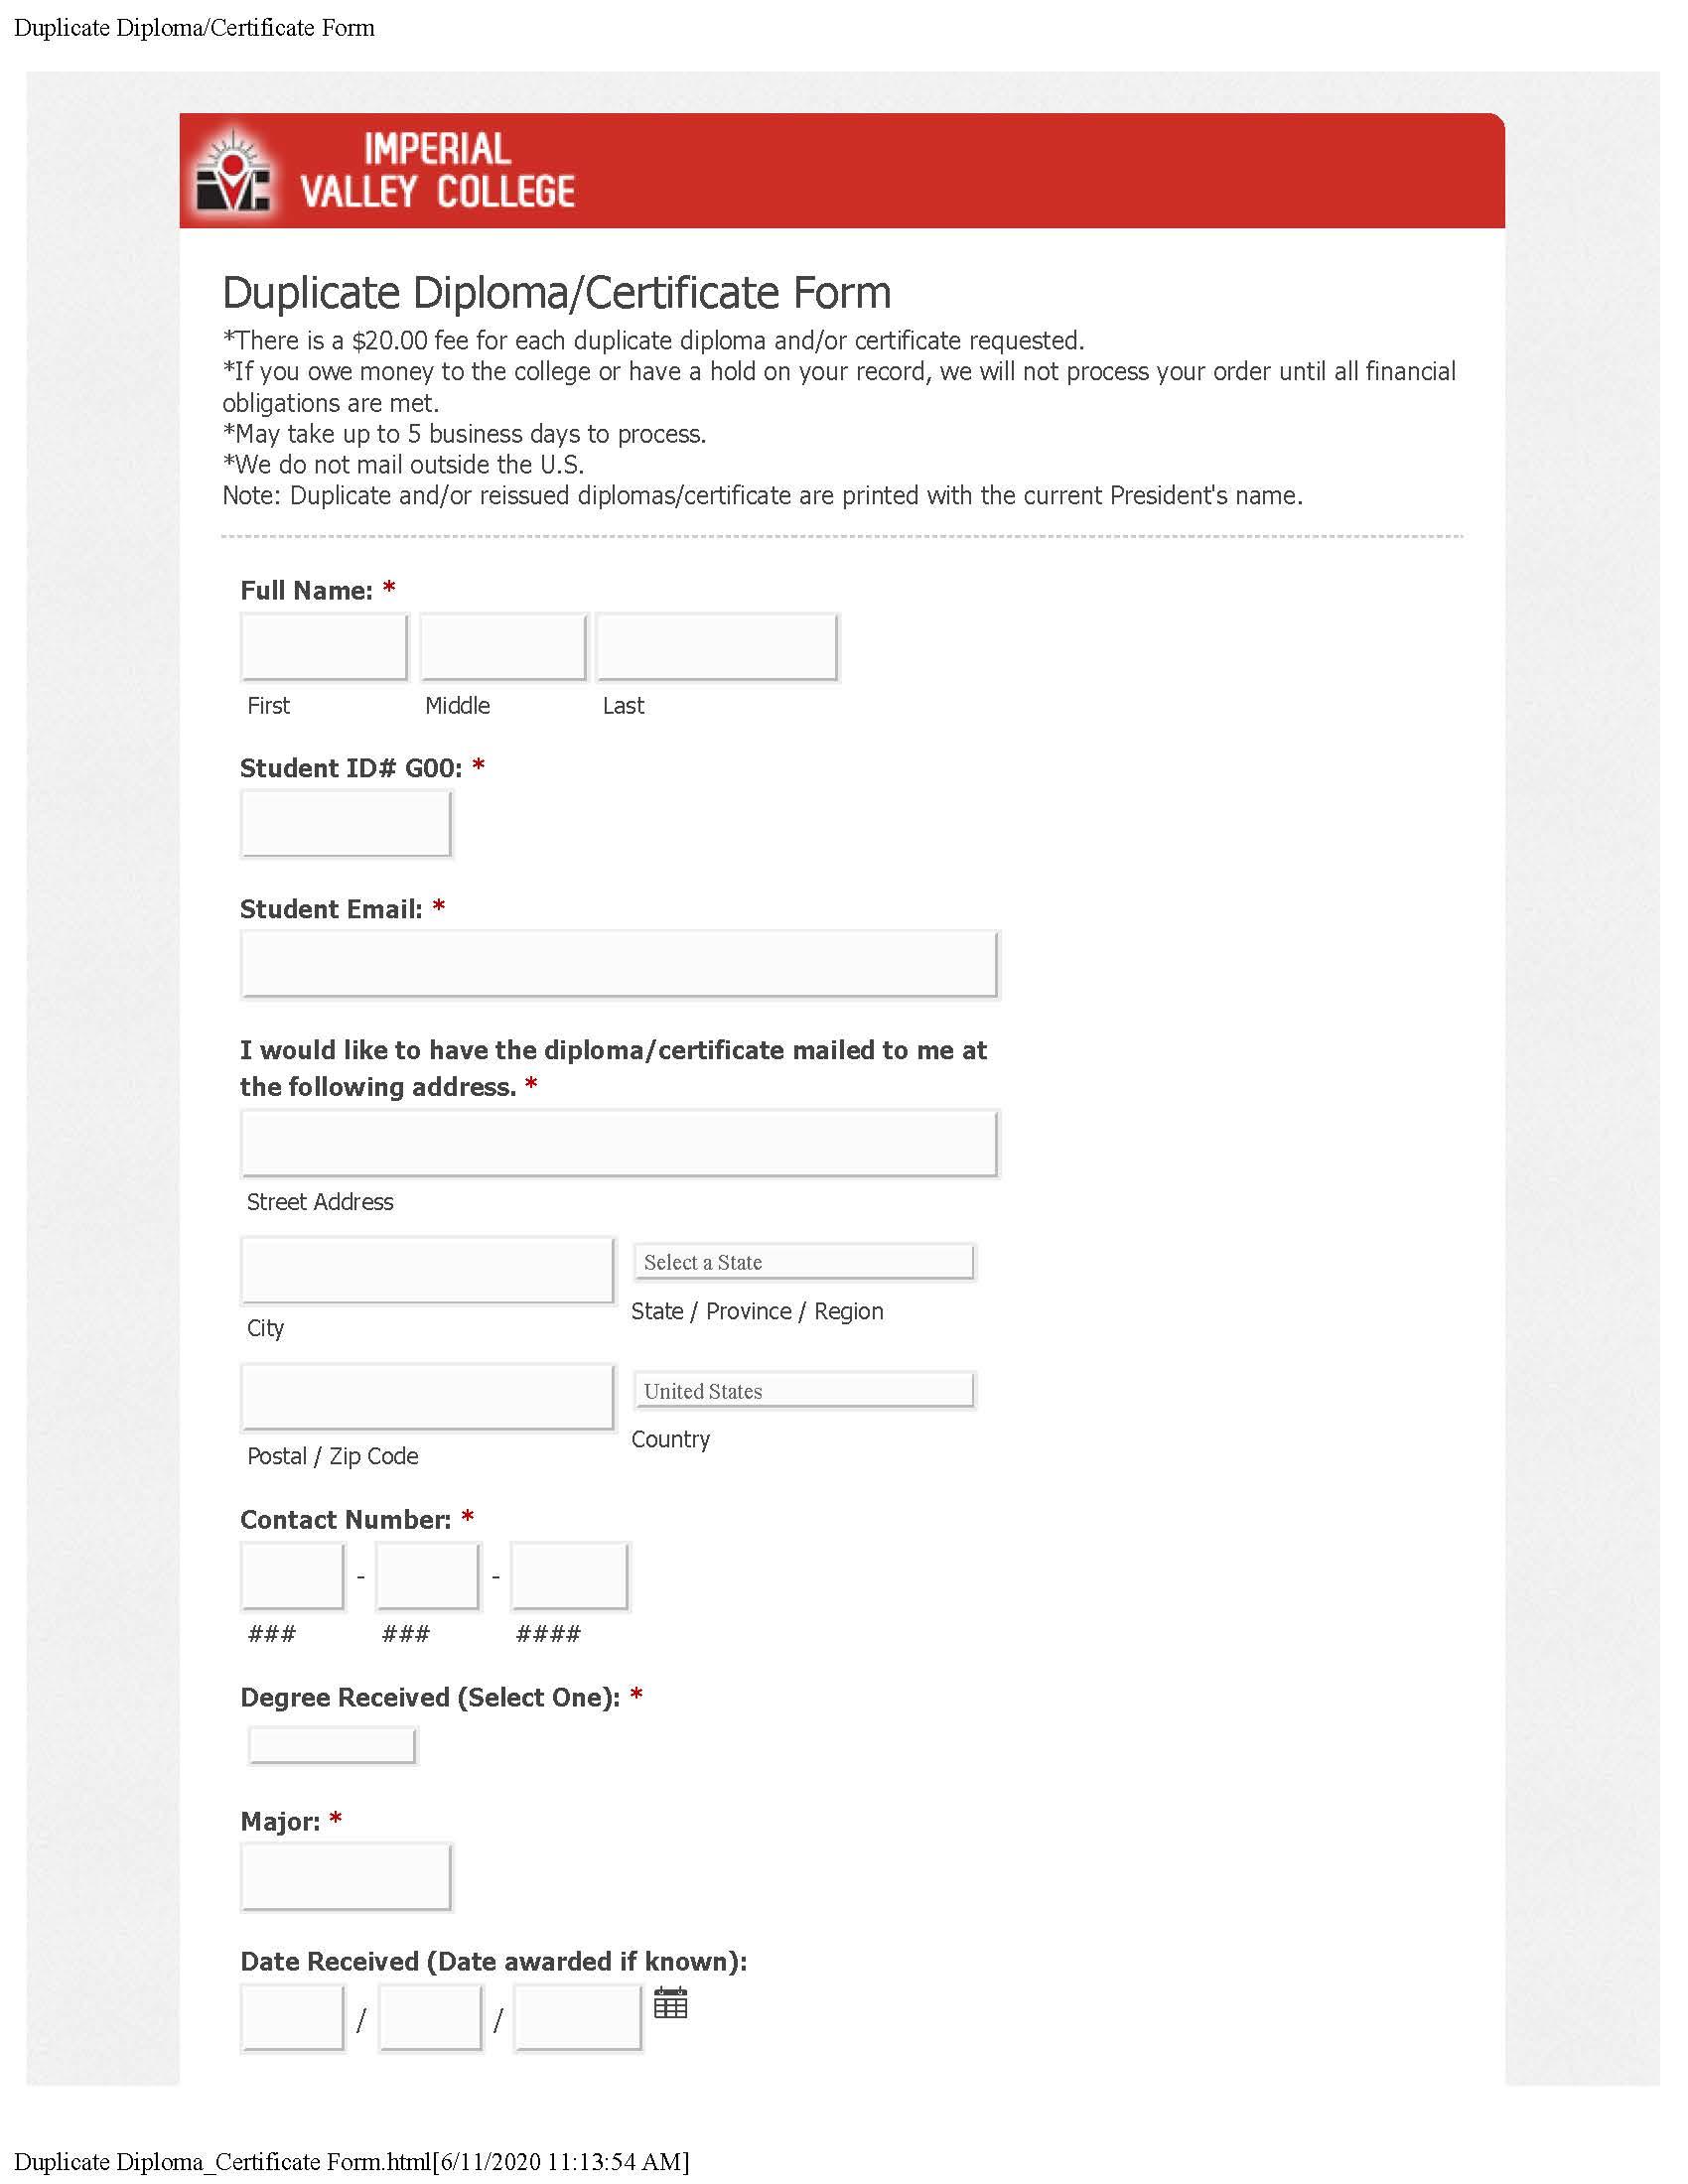 Duplicate Diploma Certificate Form